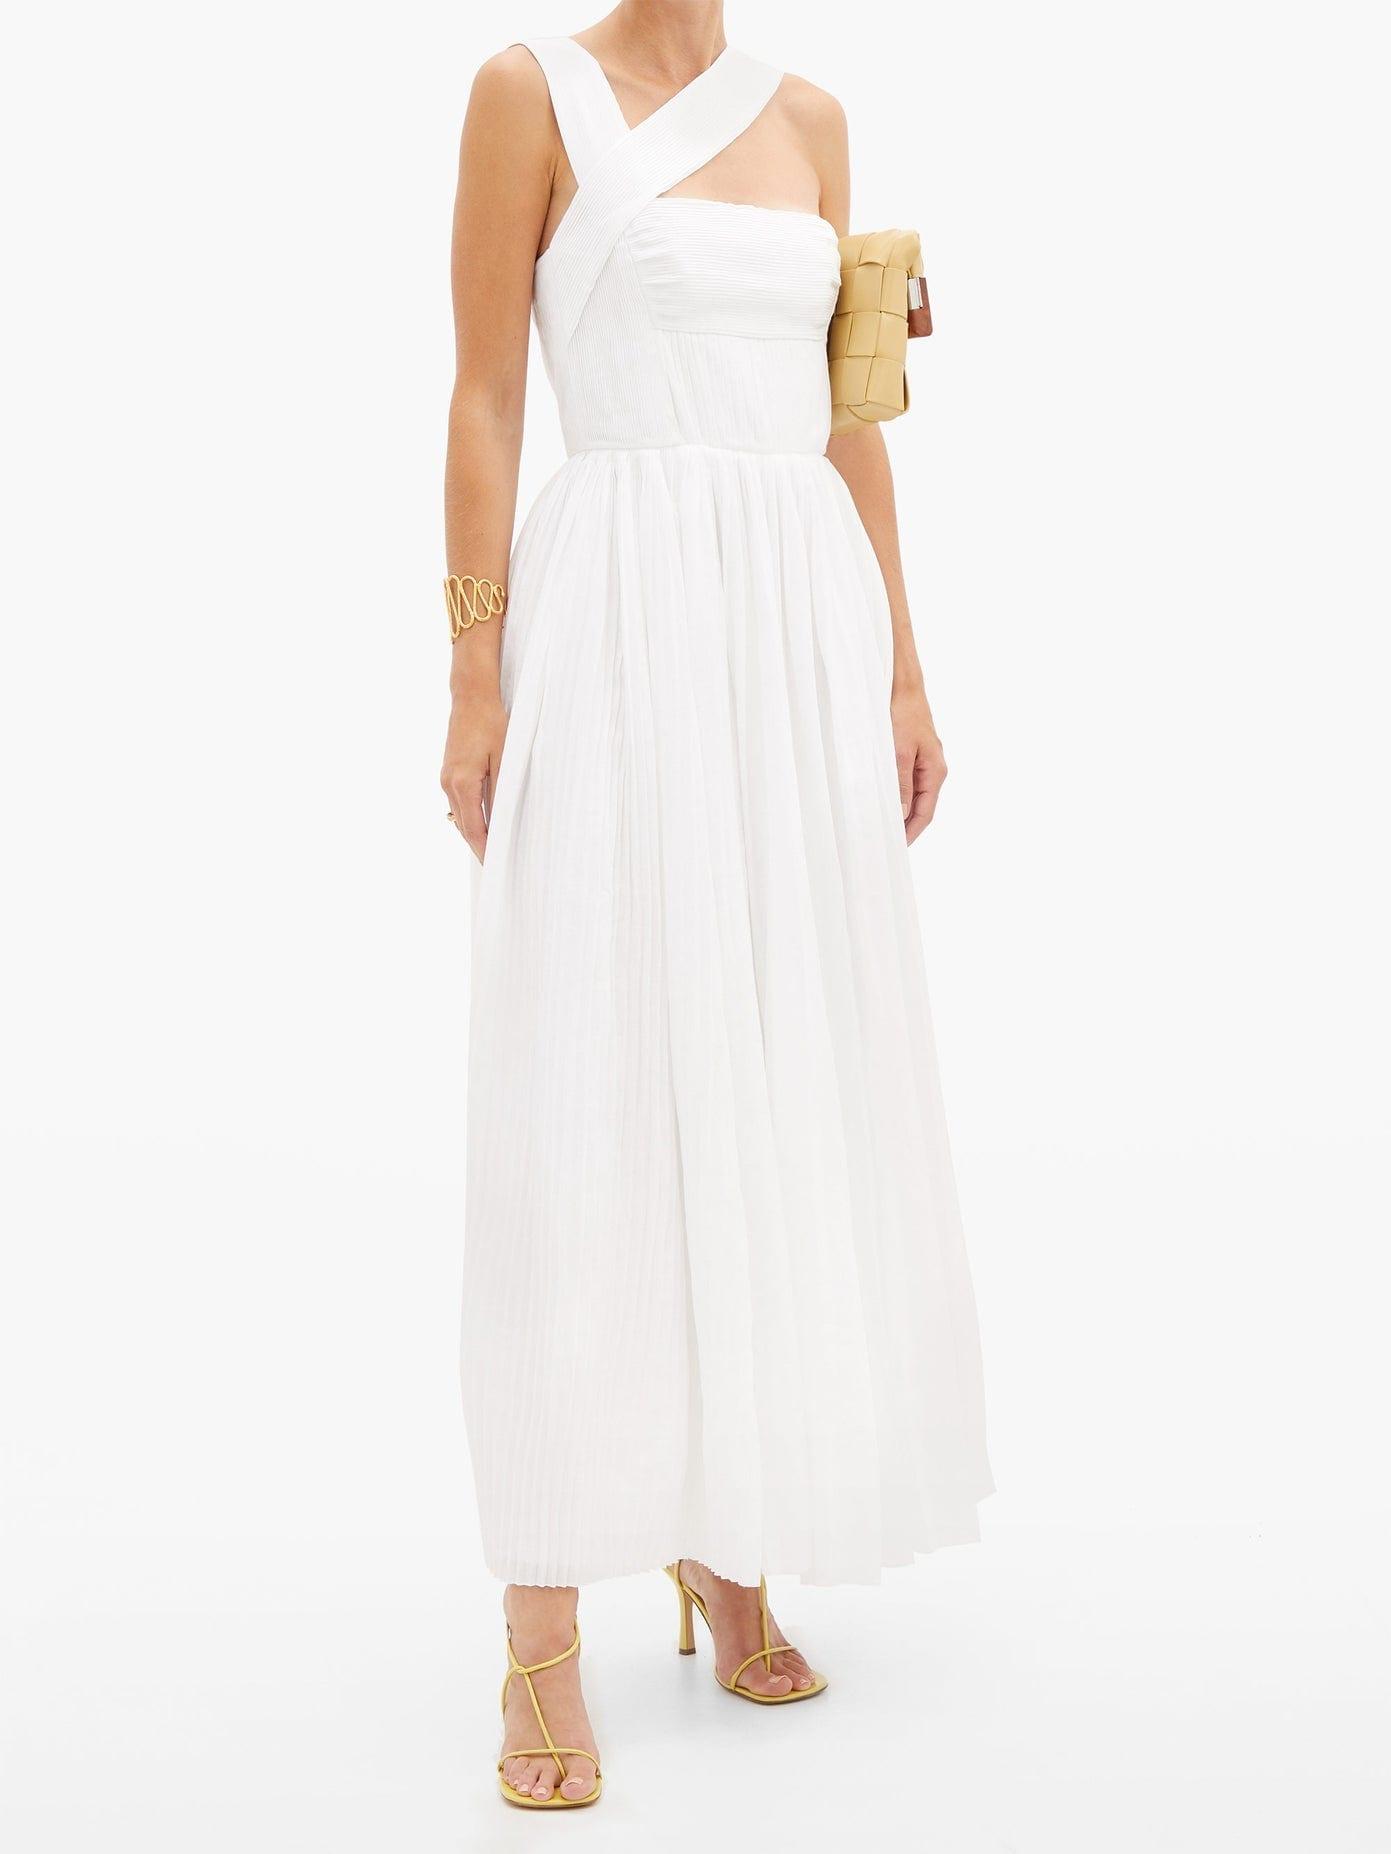 GABRIELA HEARST Norah Asymmetric Pleated Linen Dress